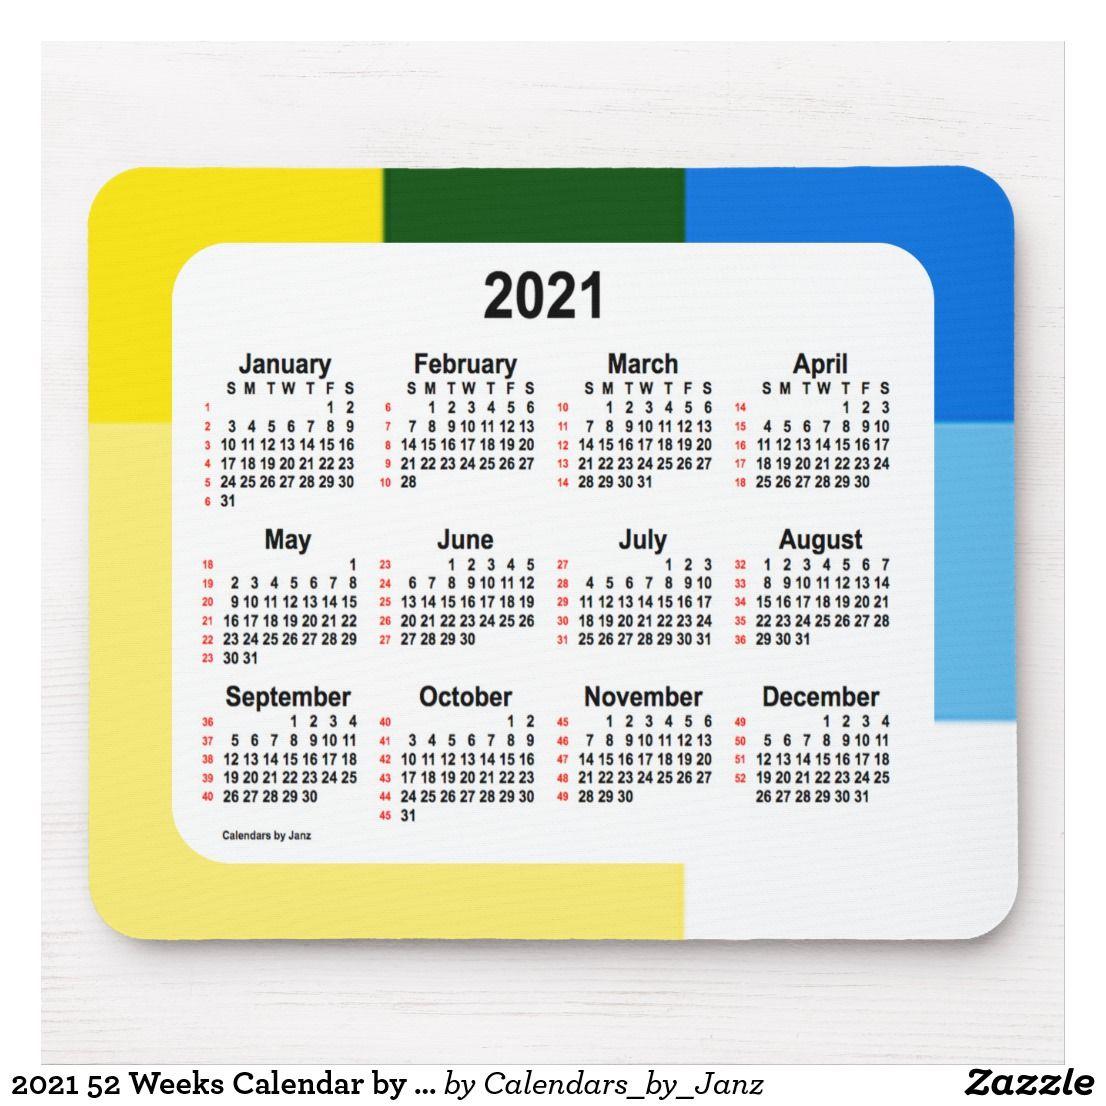 Pictures of 2021 52 Week Calendar